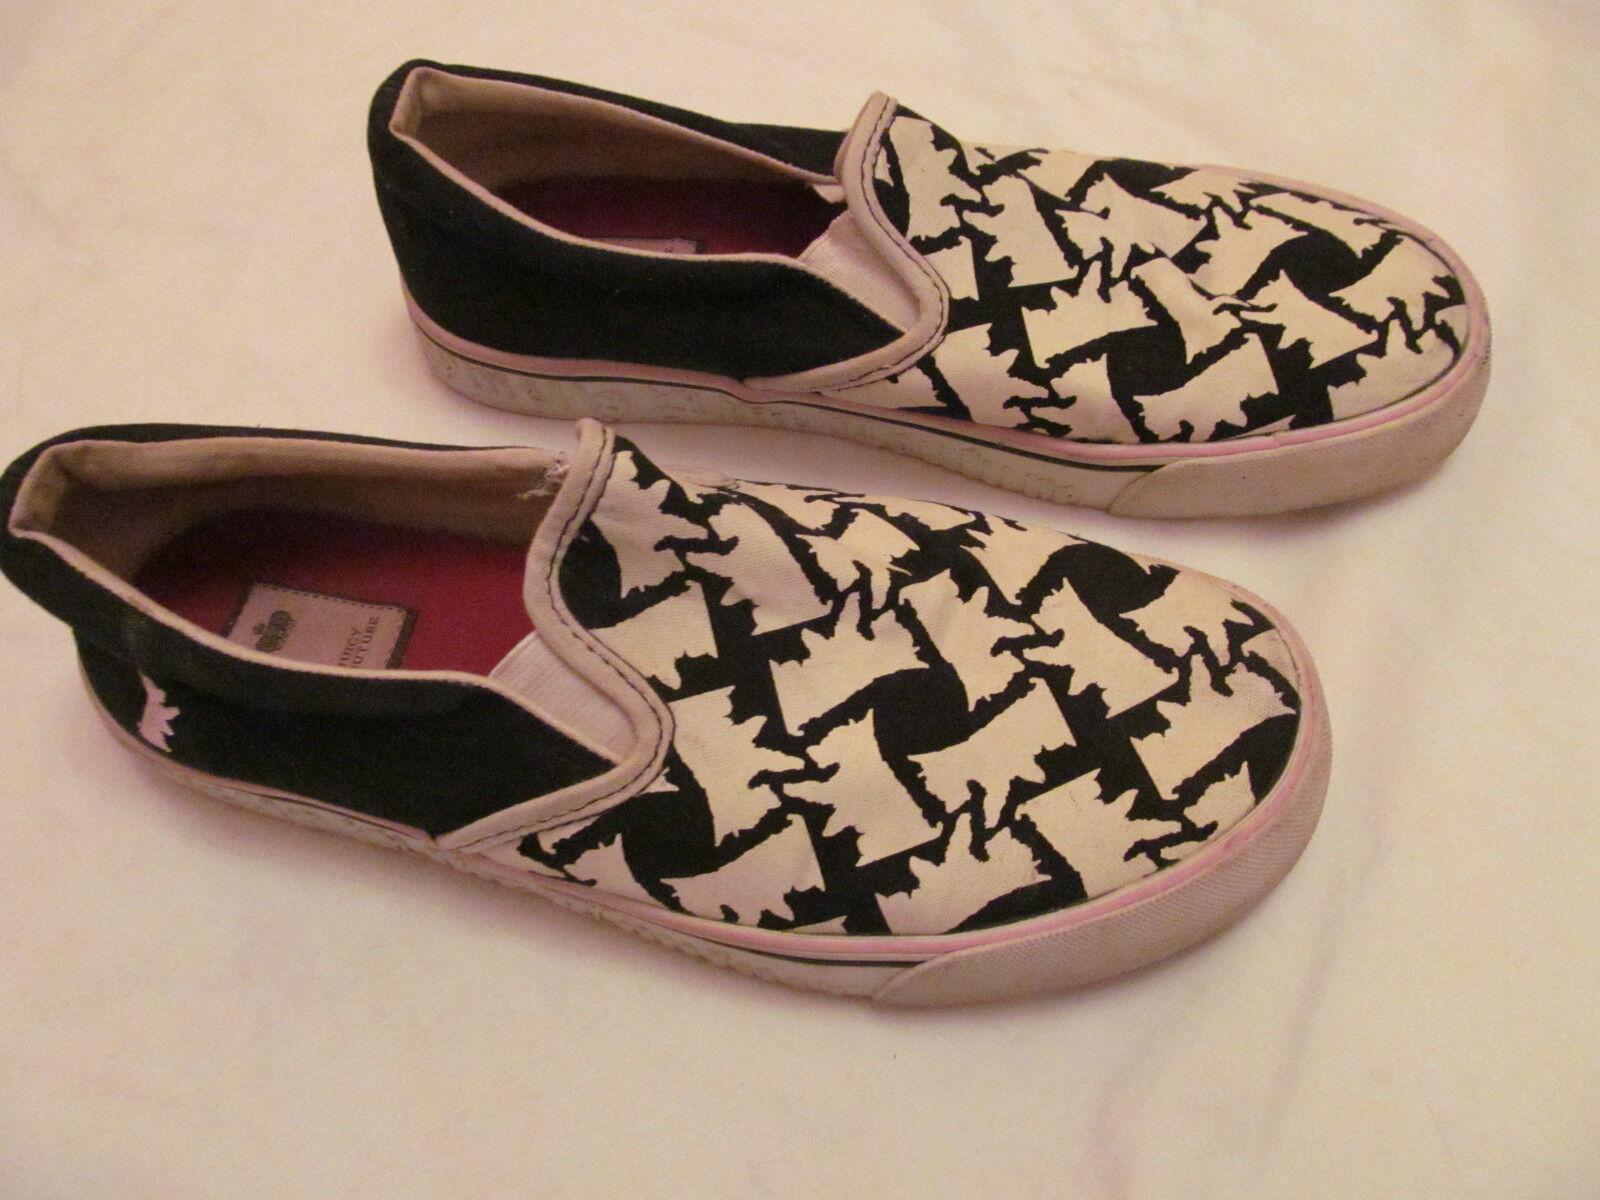 JUICY COUTURE SCOTTY DOG nero and white print slip on scarpe da ginnastica shoes 9 M